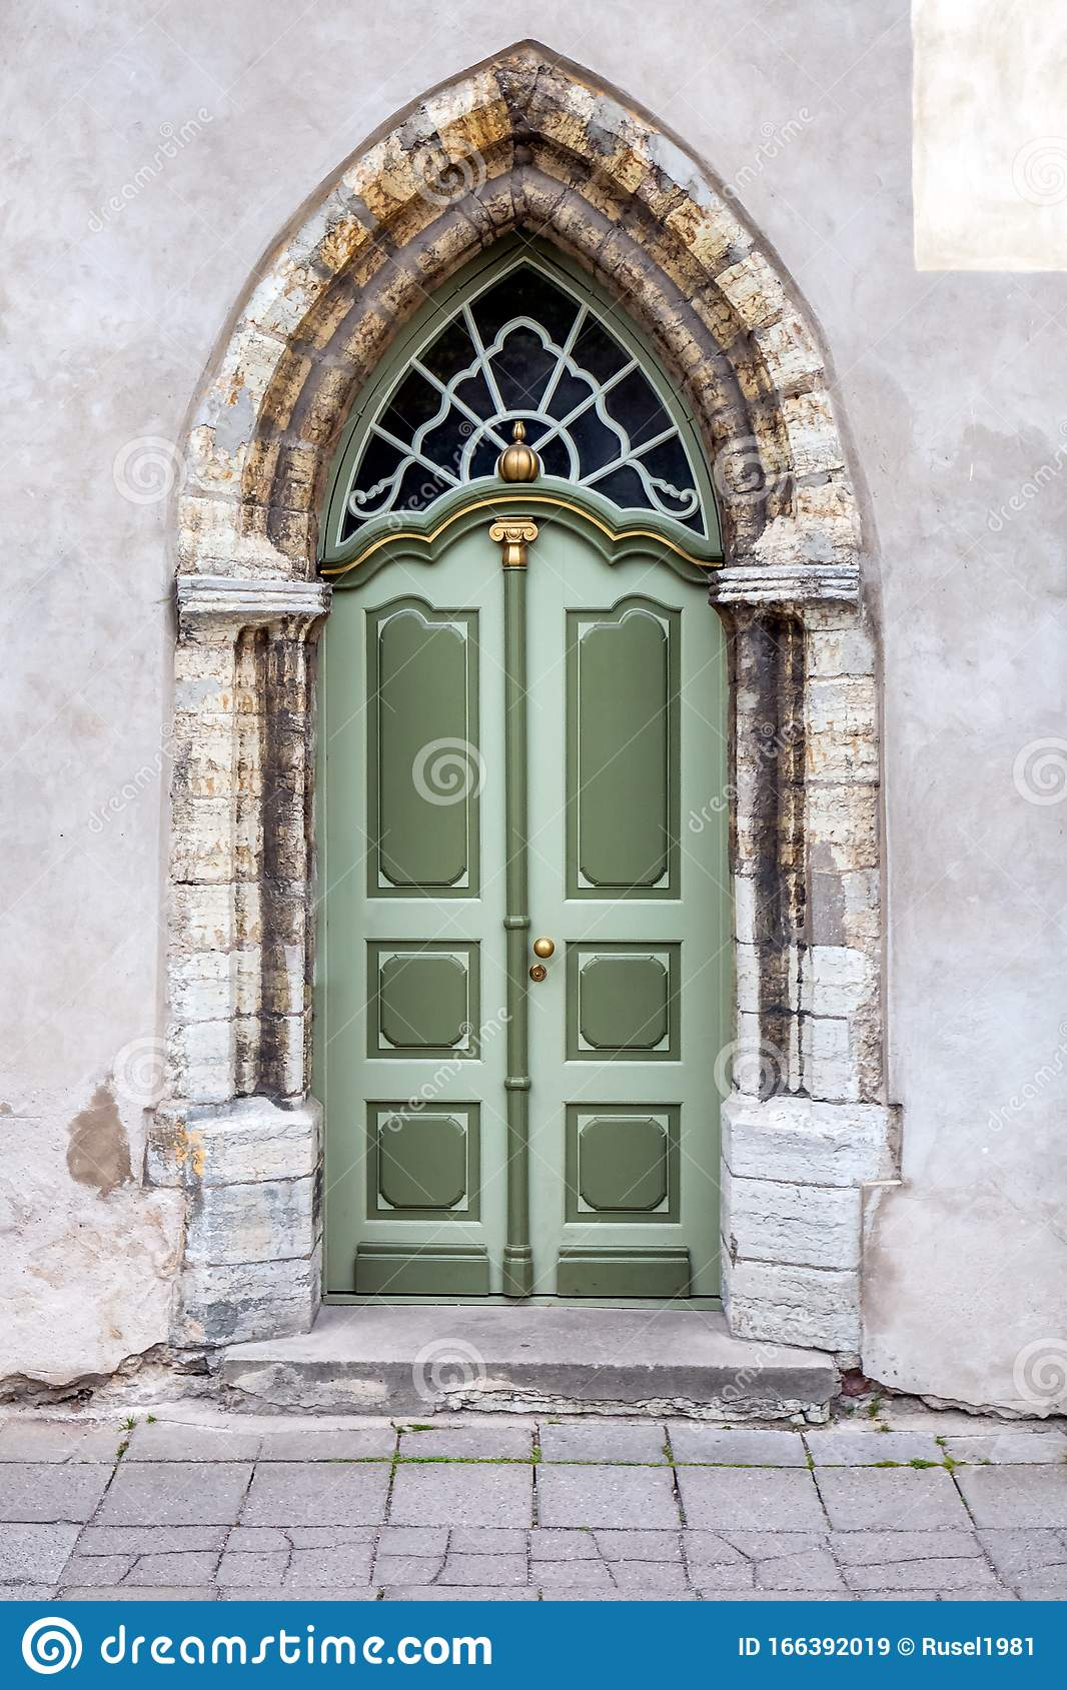 Tallinn decorated doors stock image. Image of architecture ...